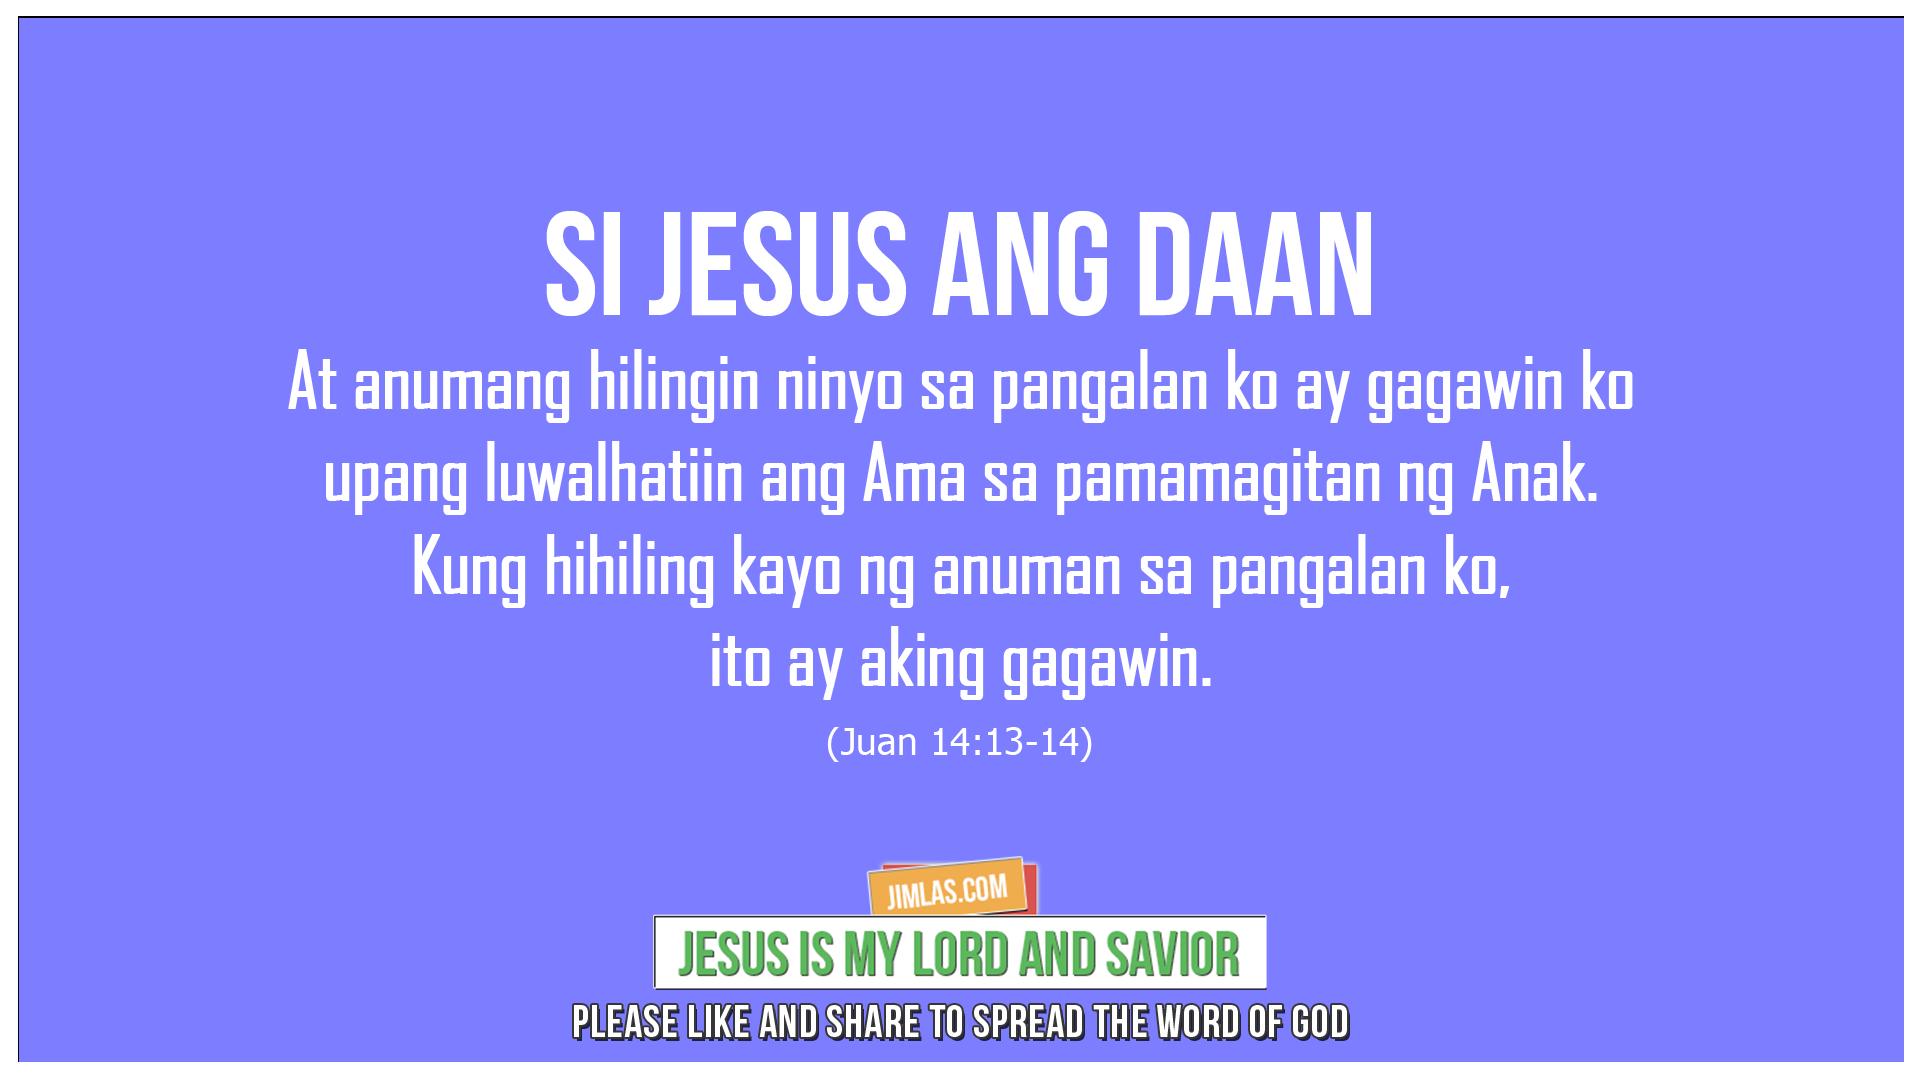 Juan 14 13-14, Juan 14:13-14